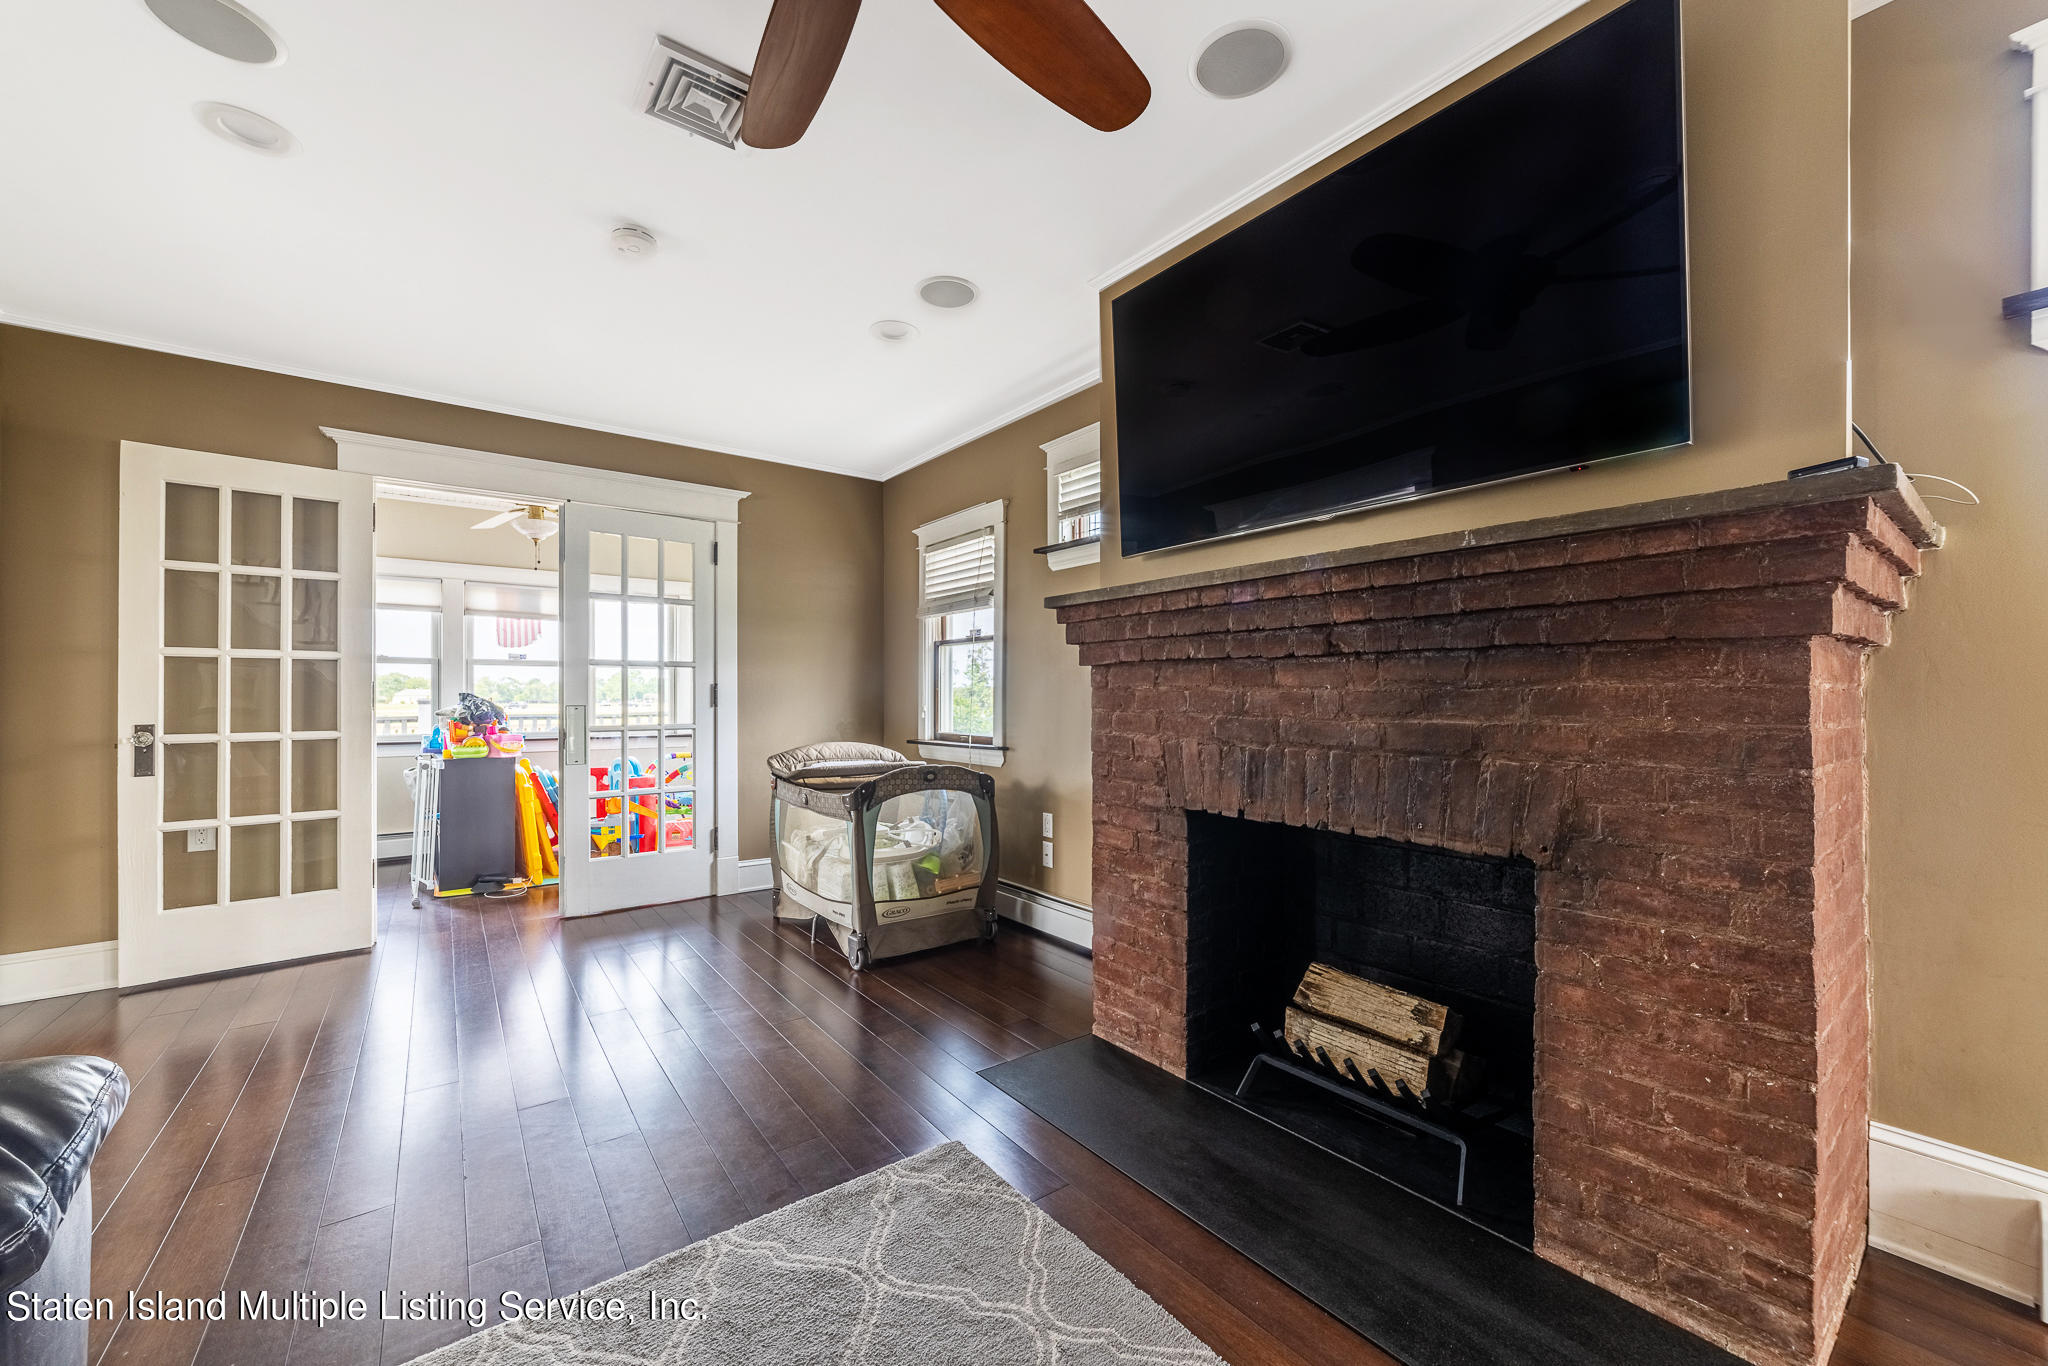 Single Family - Detached 790 New Dorp Lane  Staten Island, NY 10306, MLS-1146574-9